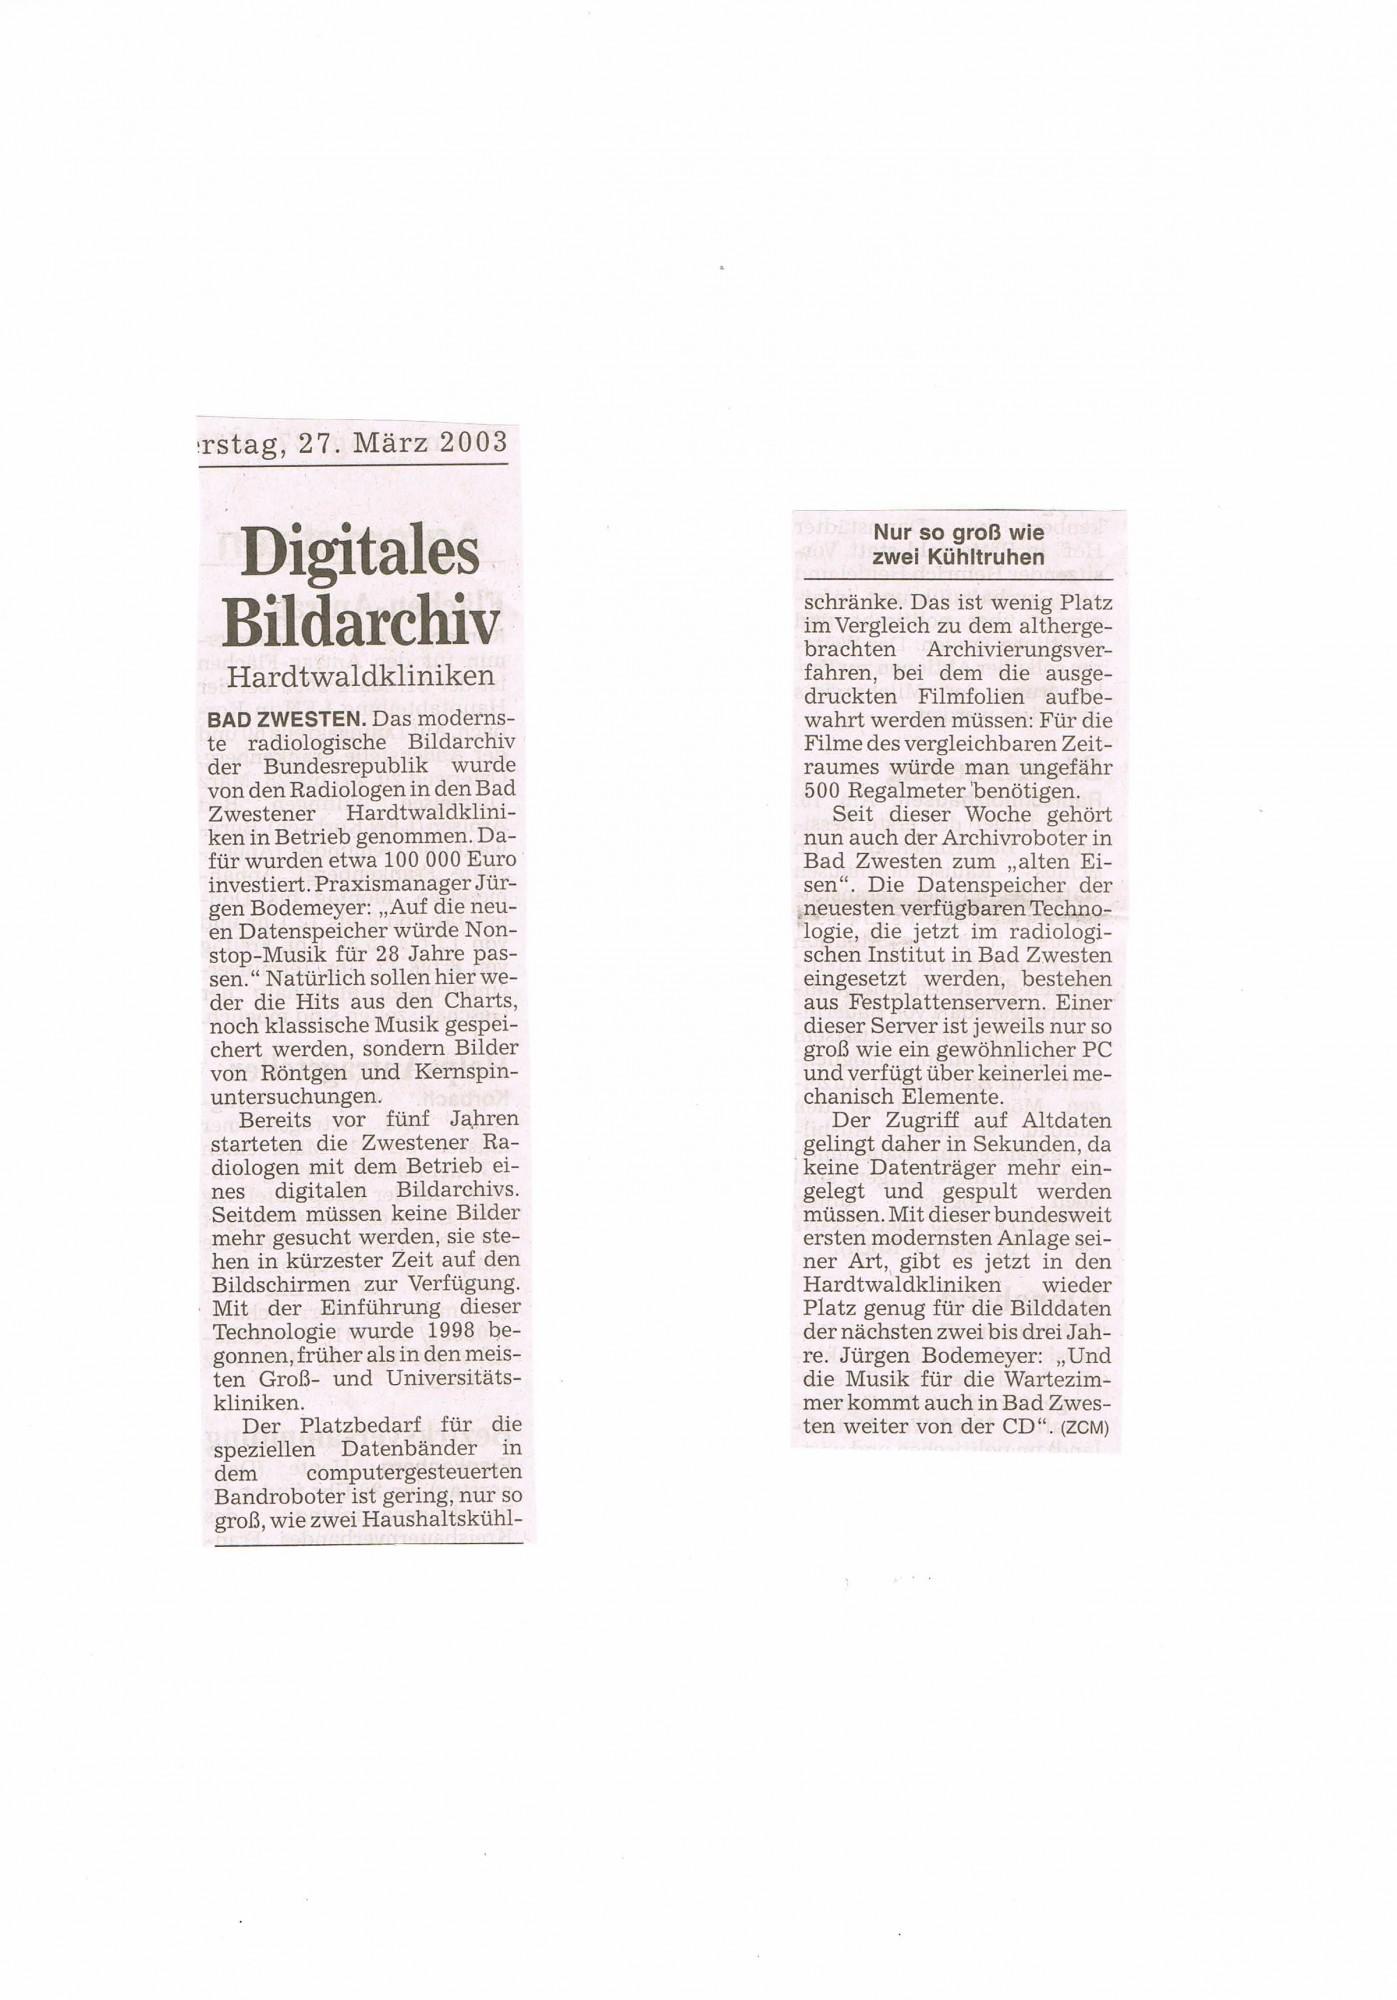 2003-03-27 Digitales Bildarchiv-001